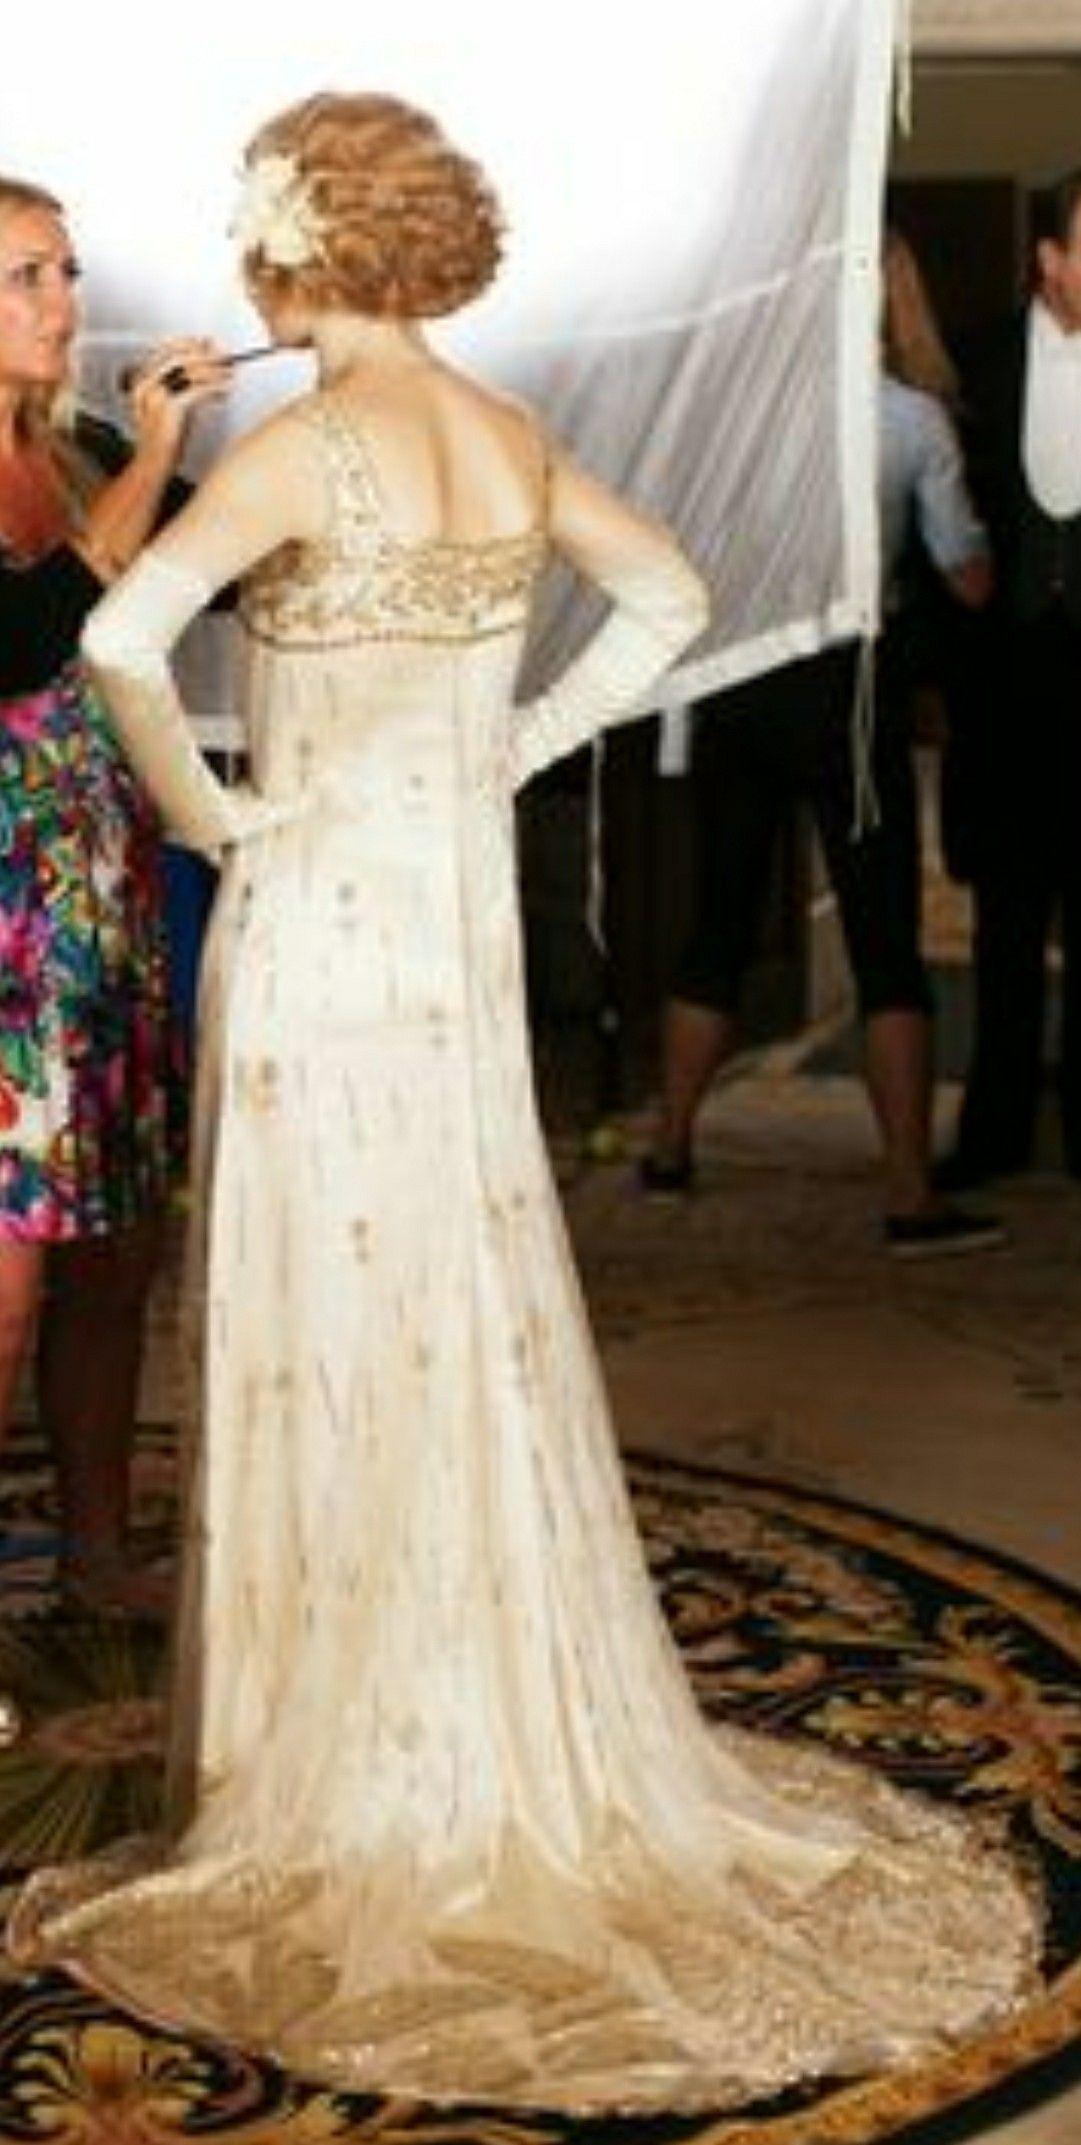 18th century wedding dress  Pin by Chaucer on Fashion  Pinterest  Fashion